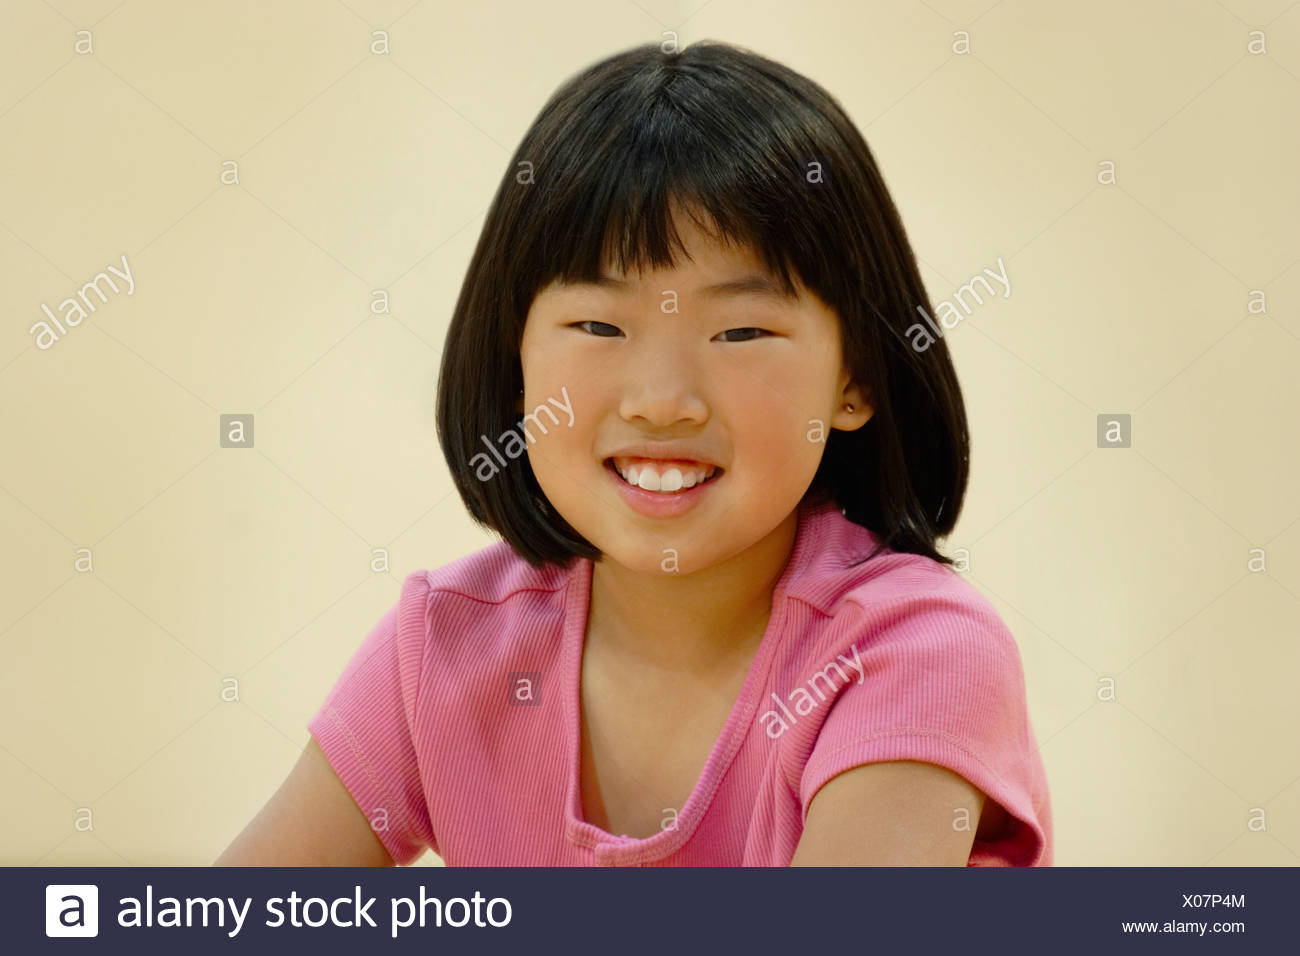 Smiling asian girl - Stock Image